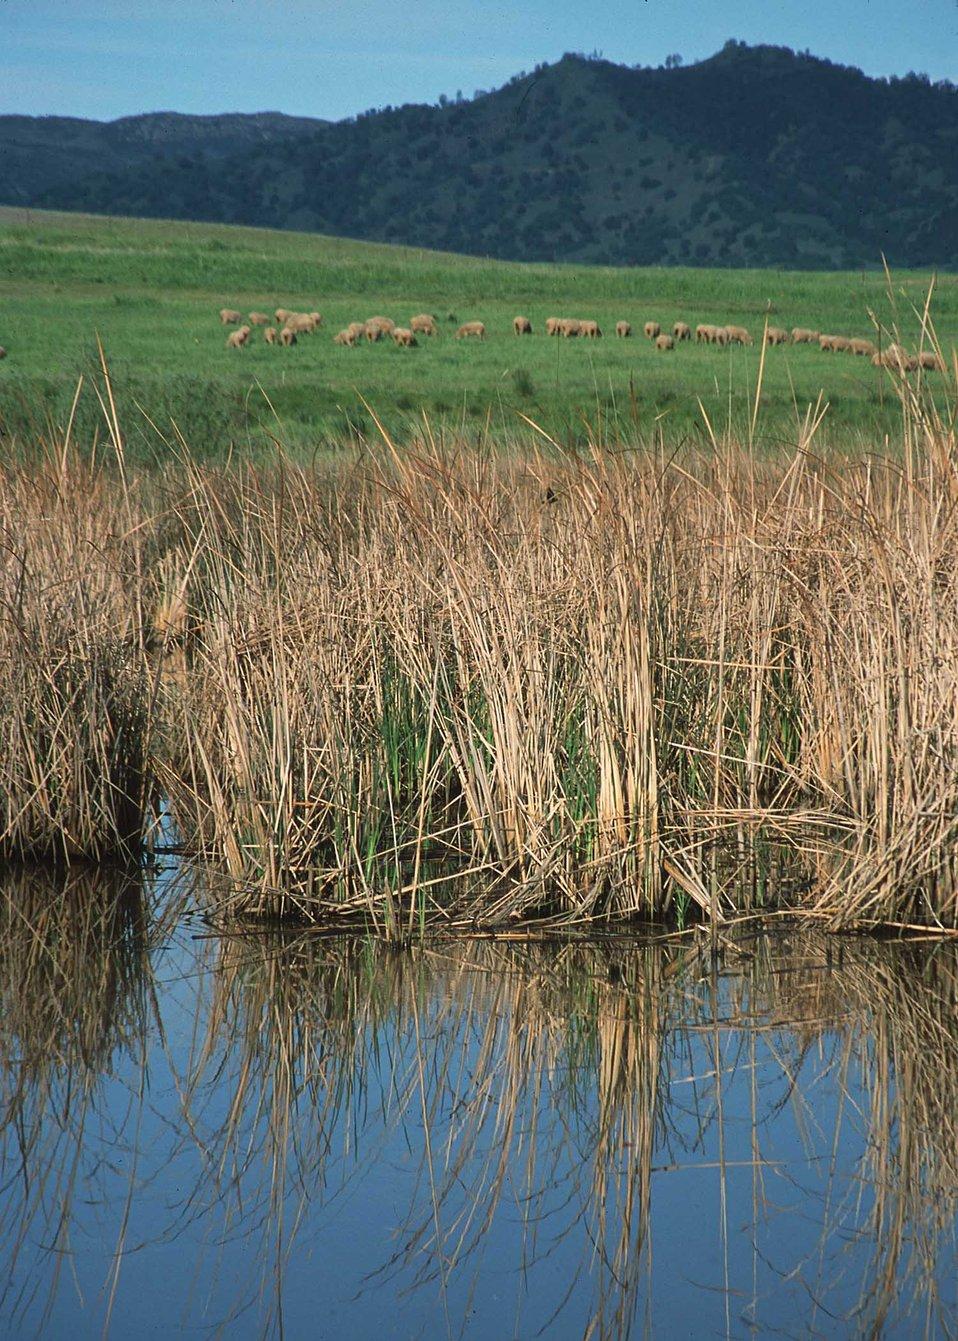 Sheep graze in pasture in background.  Restored wetland in foreground.